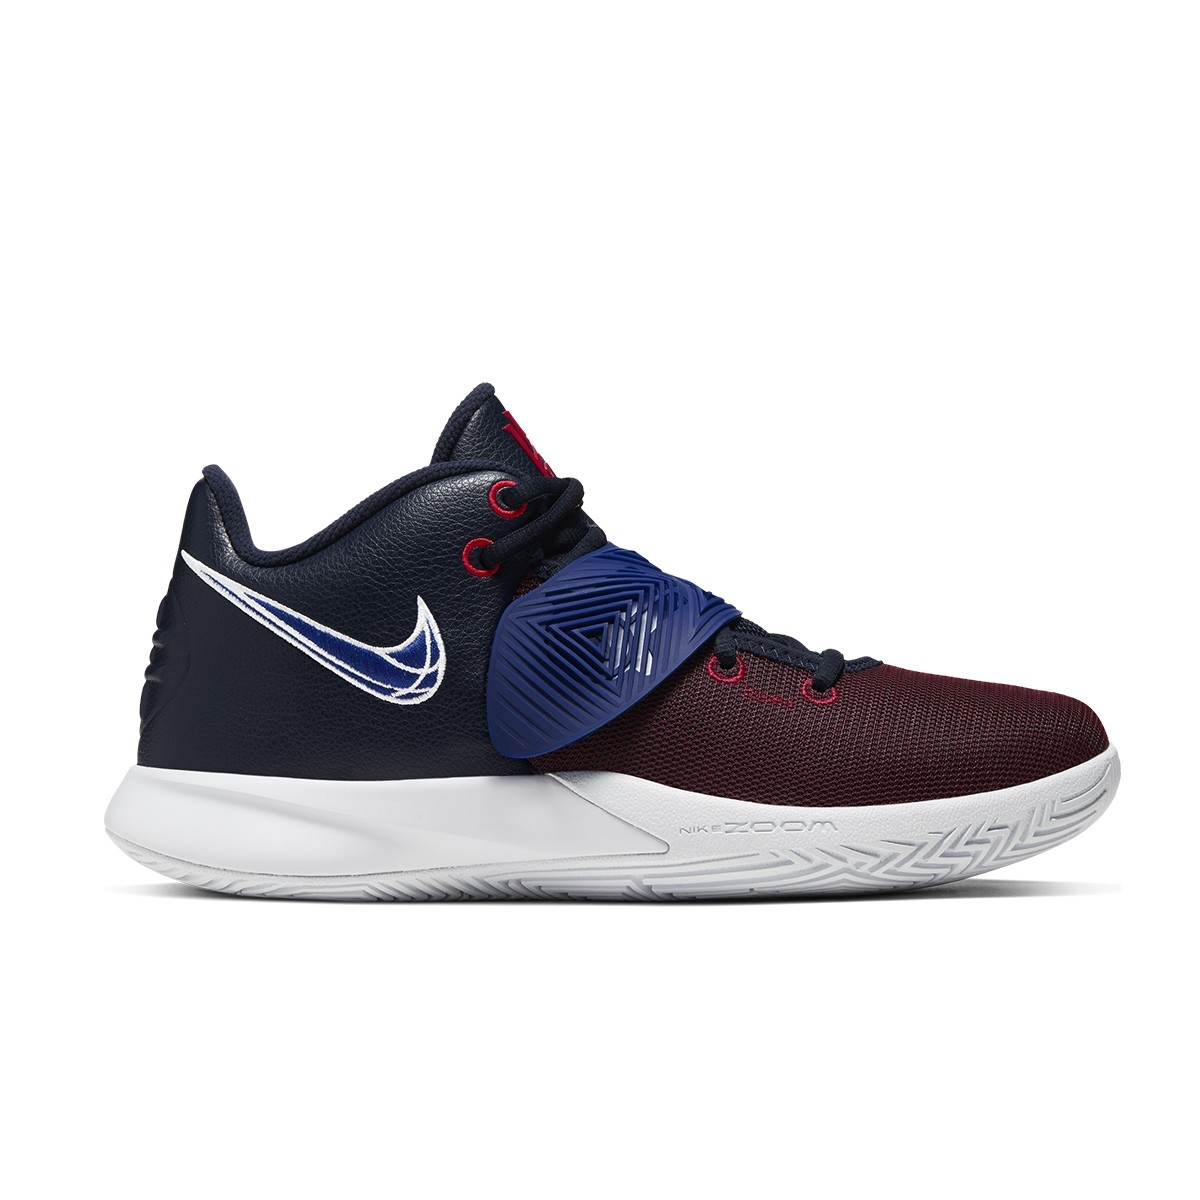 Nike Kyrie Flytrap III Jr 'USA'